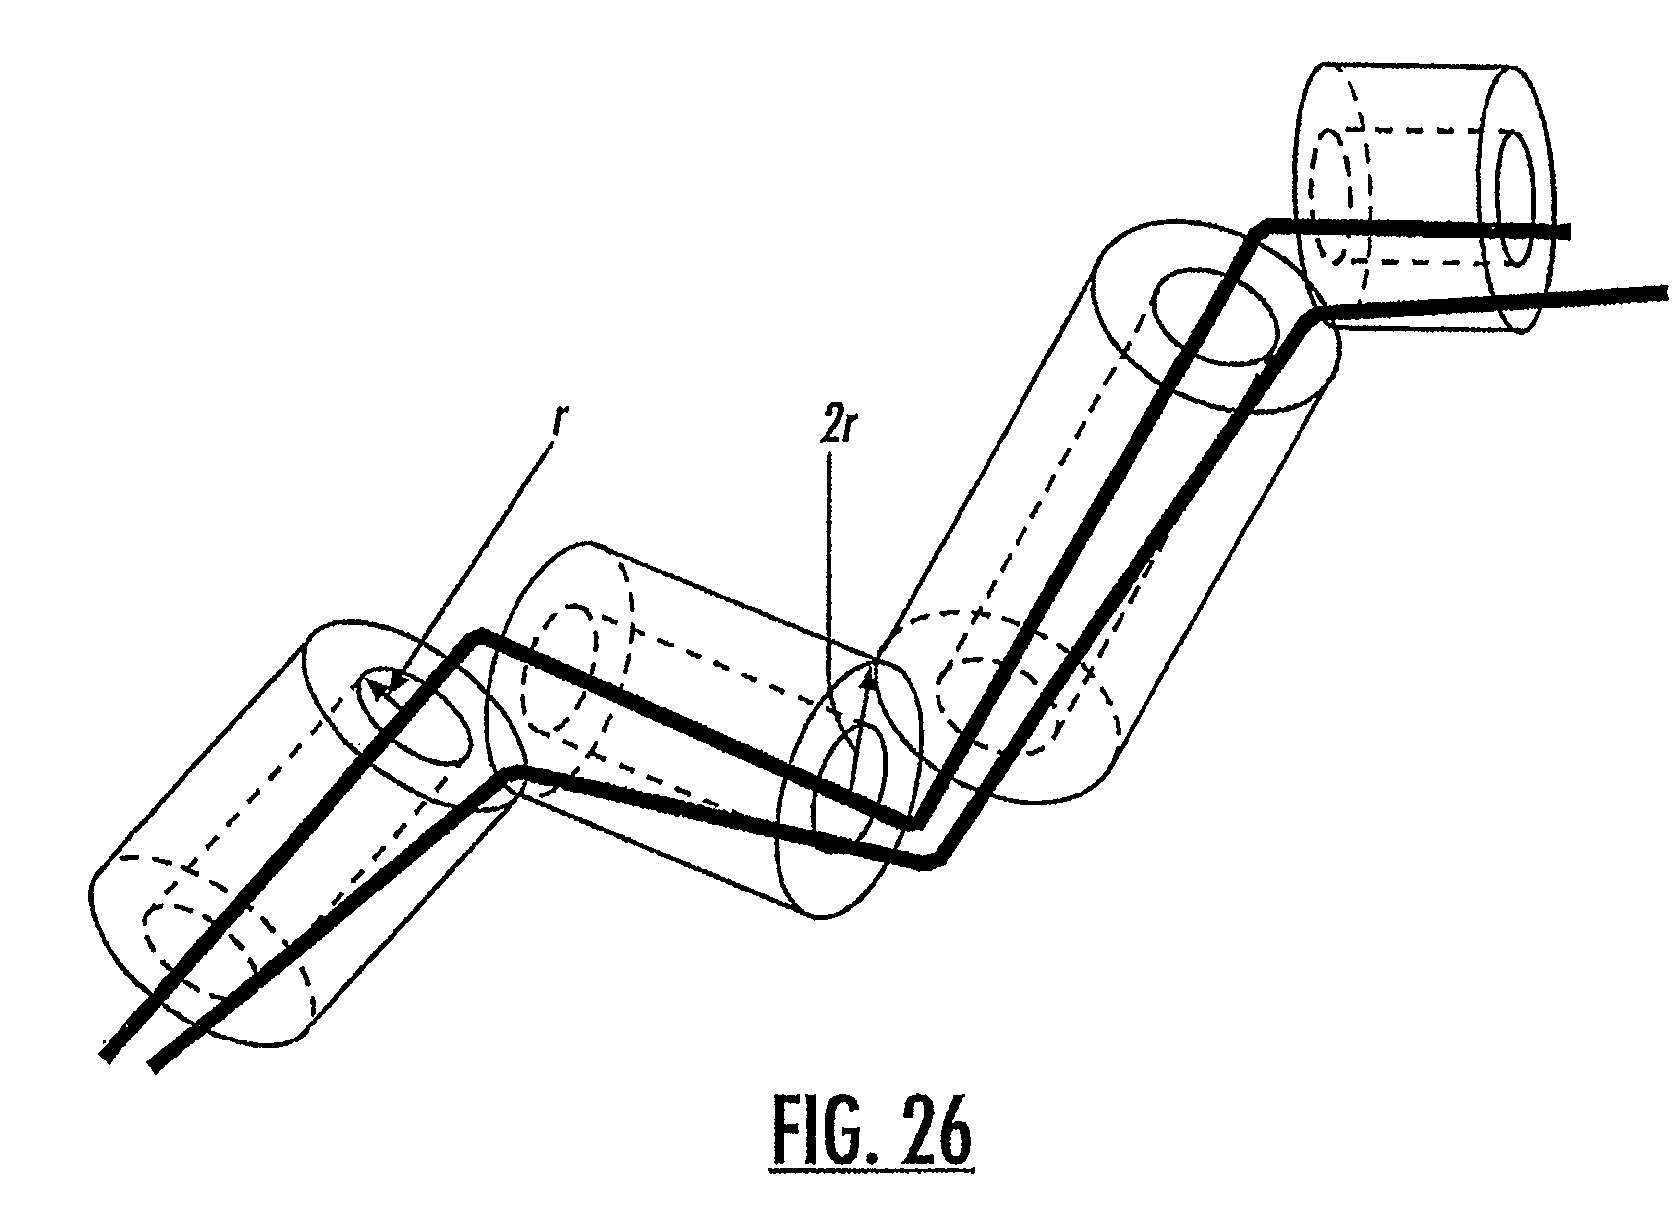 Rocket Ship Drawings